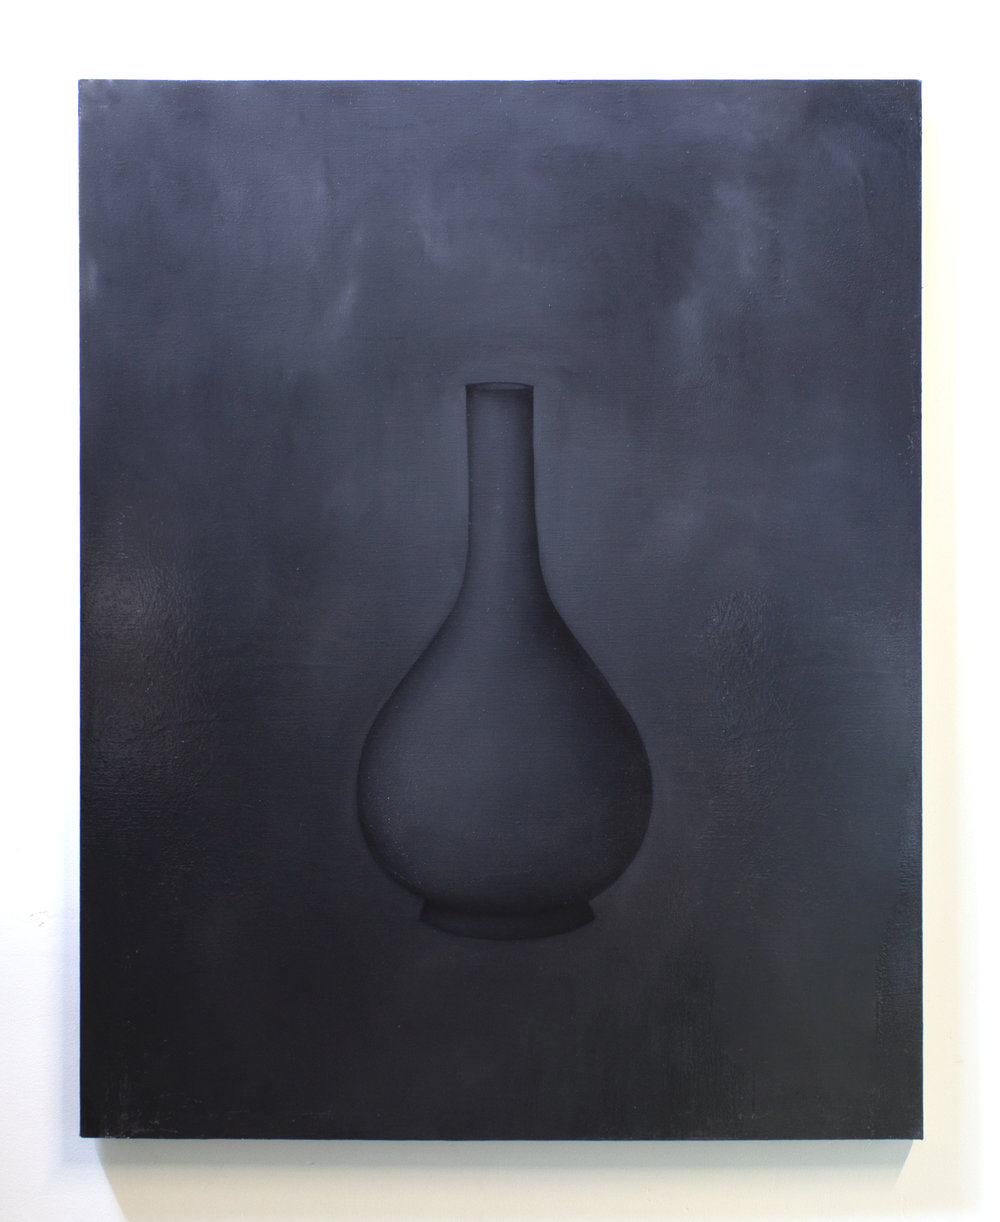 Vase (After Ming Dynasty Piece)